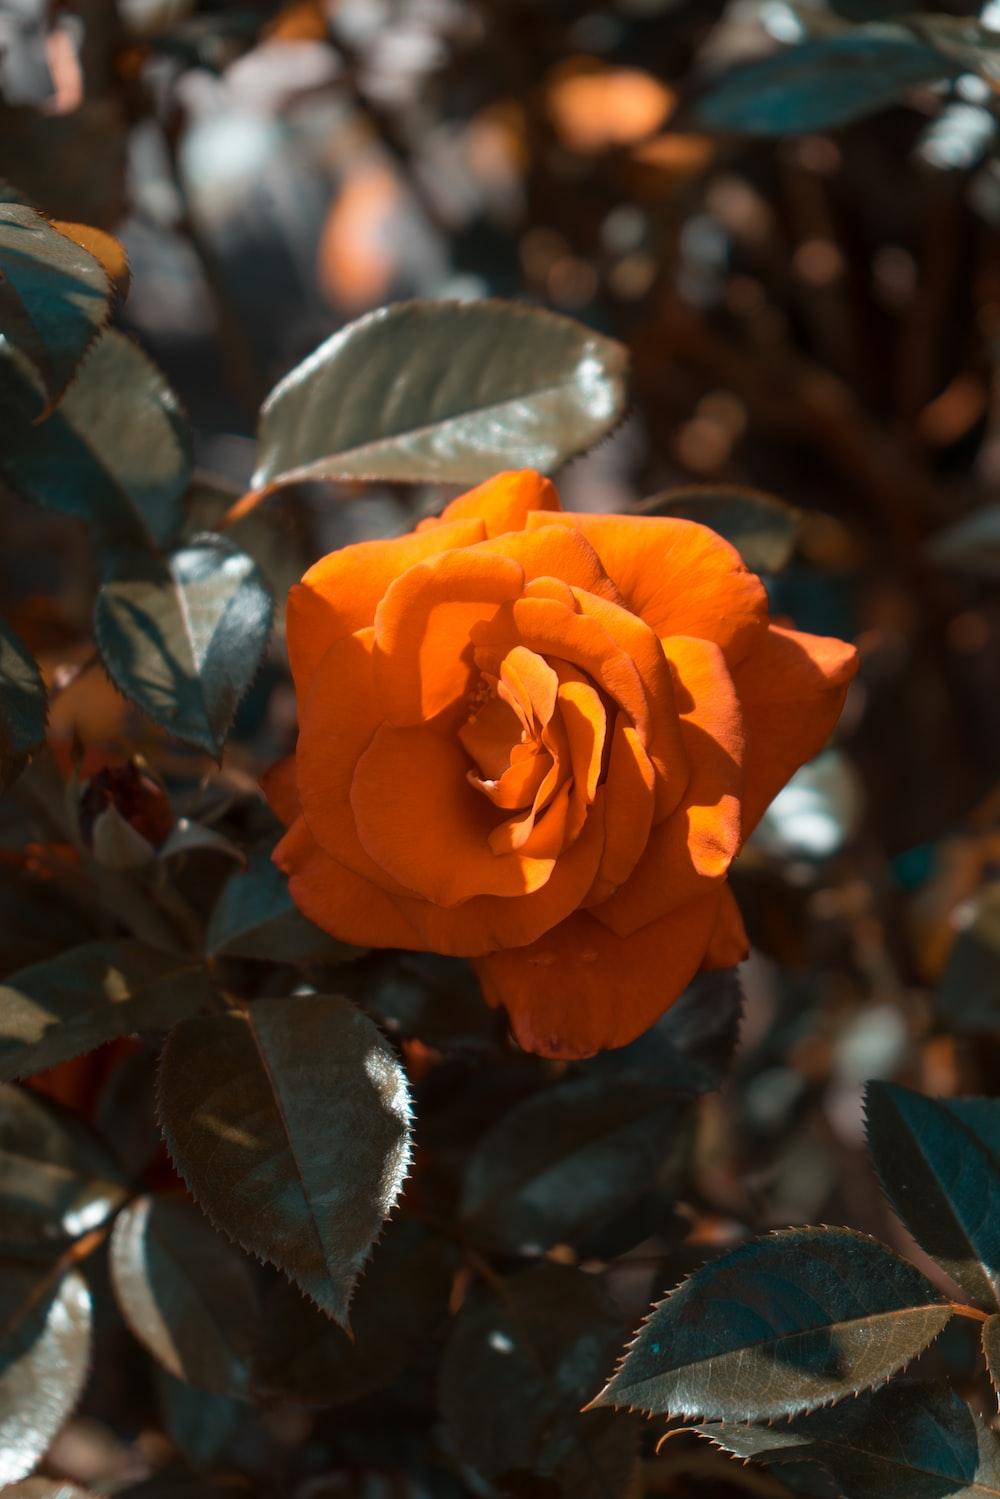 orange rose flower bloom close-up photography